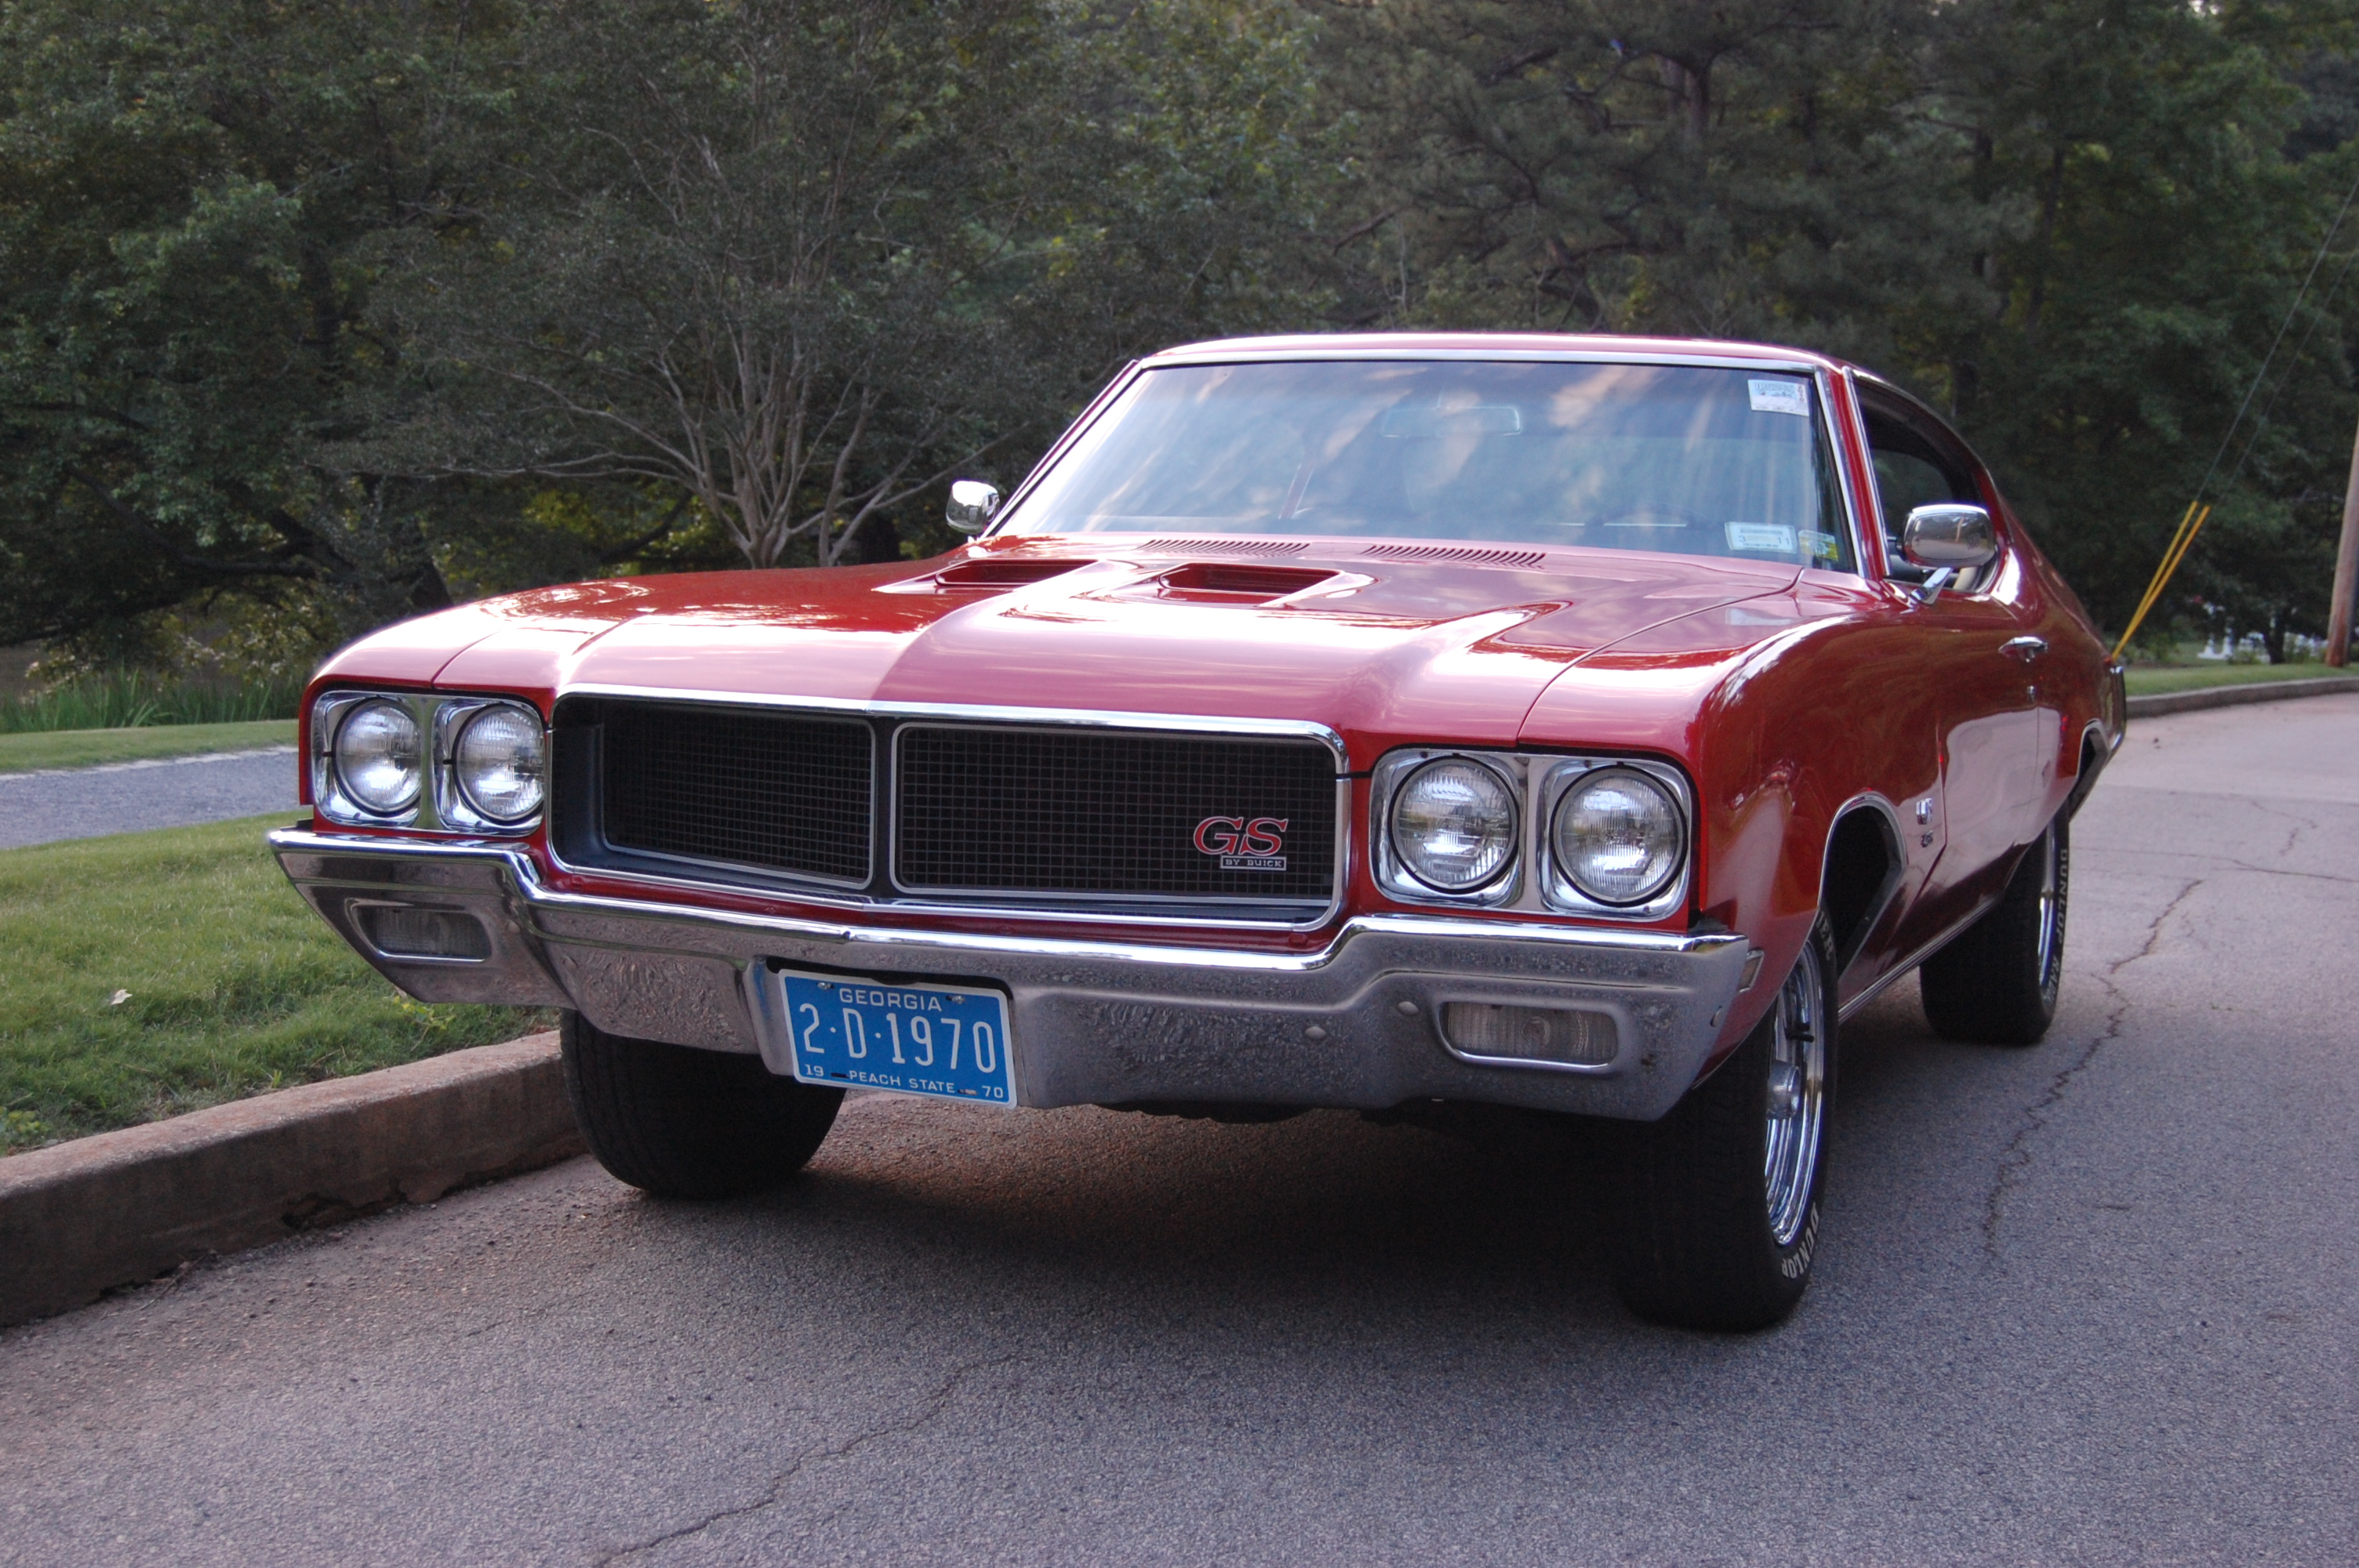 70 Buick GS455 in Atlanta GA, 20K - Cars For Sale - Antique ...